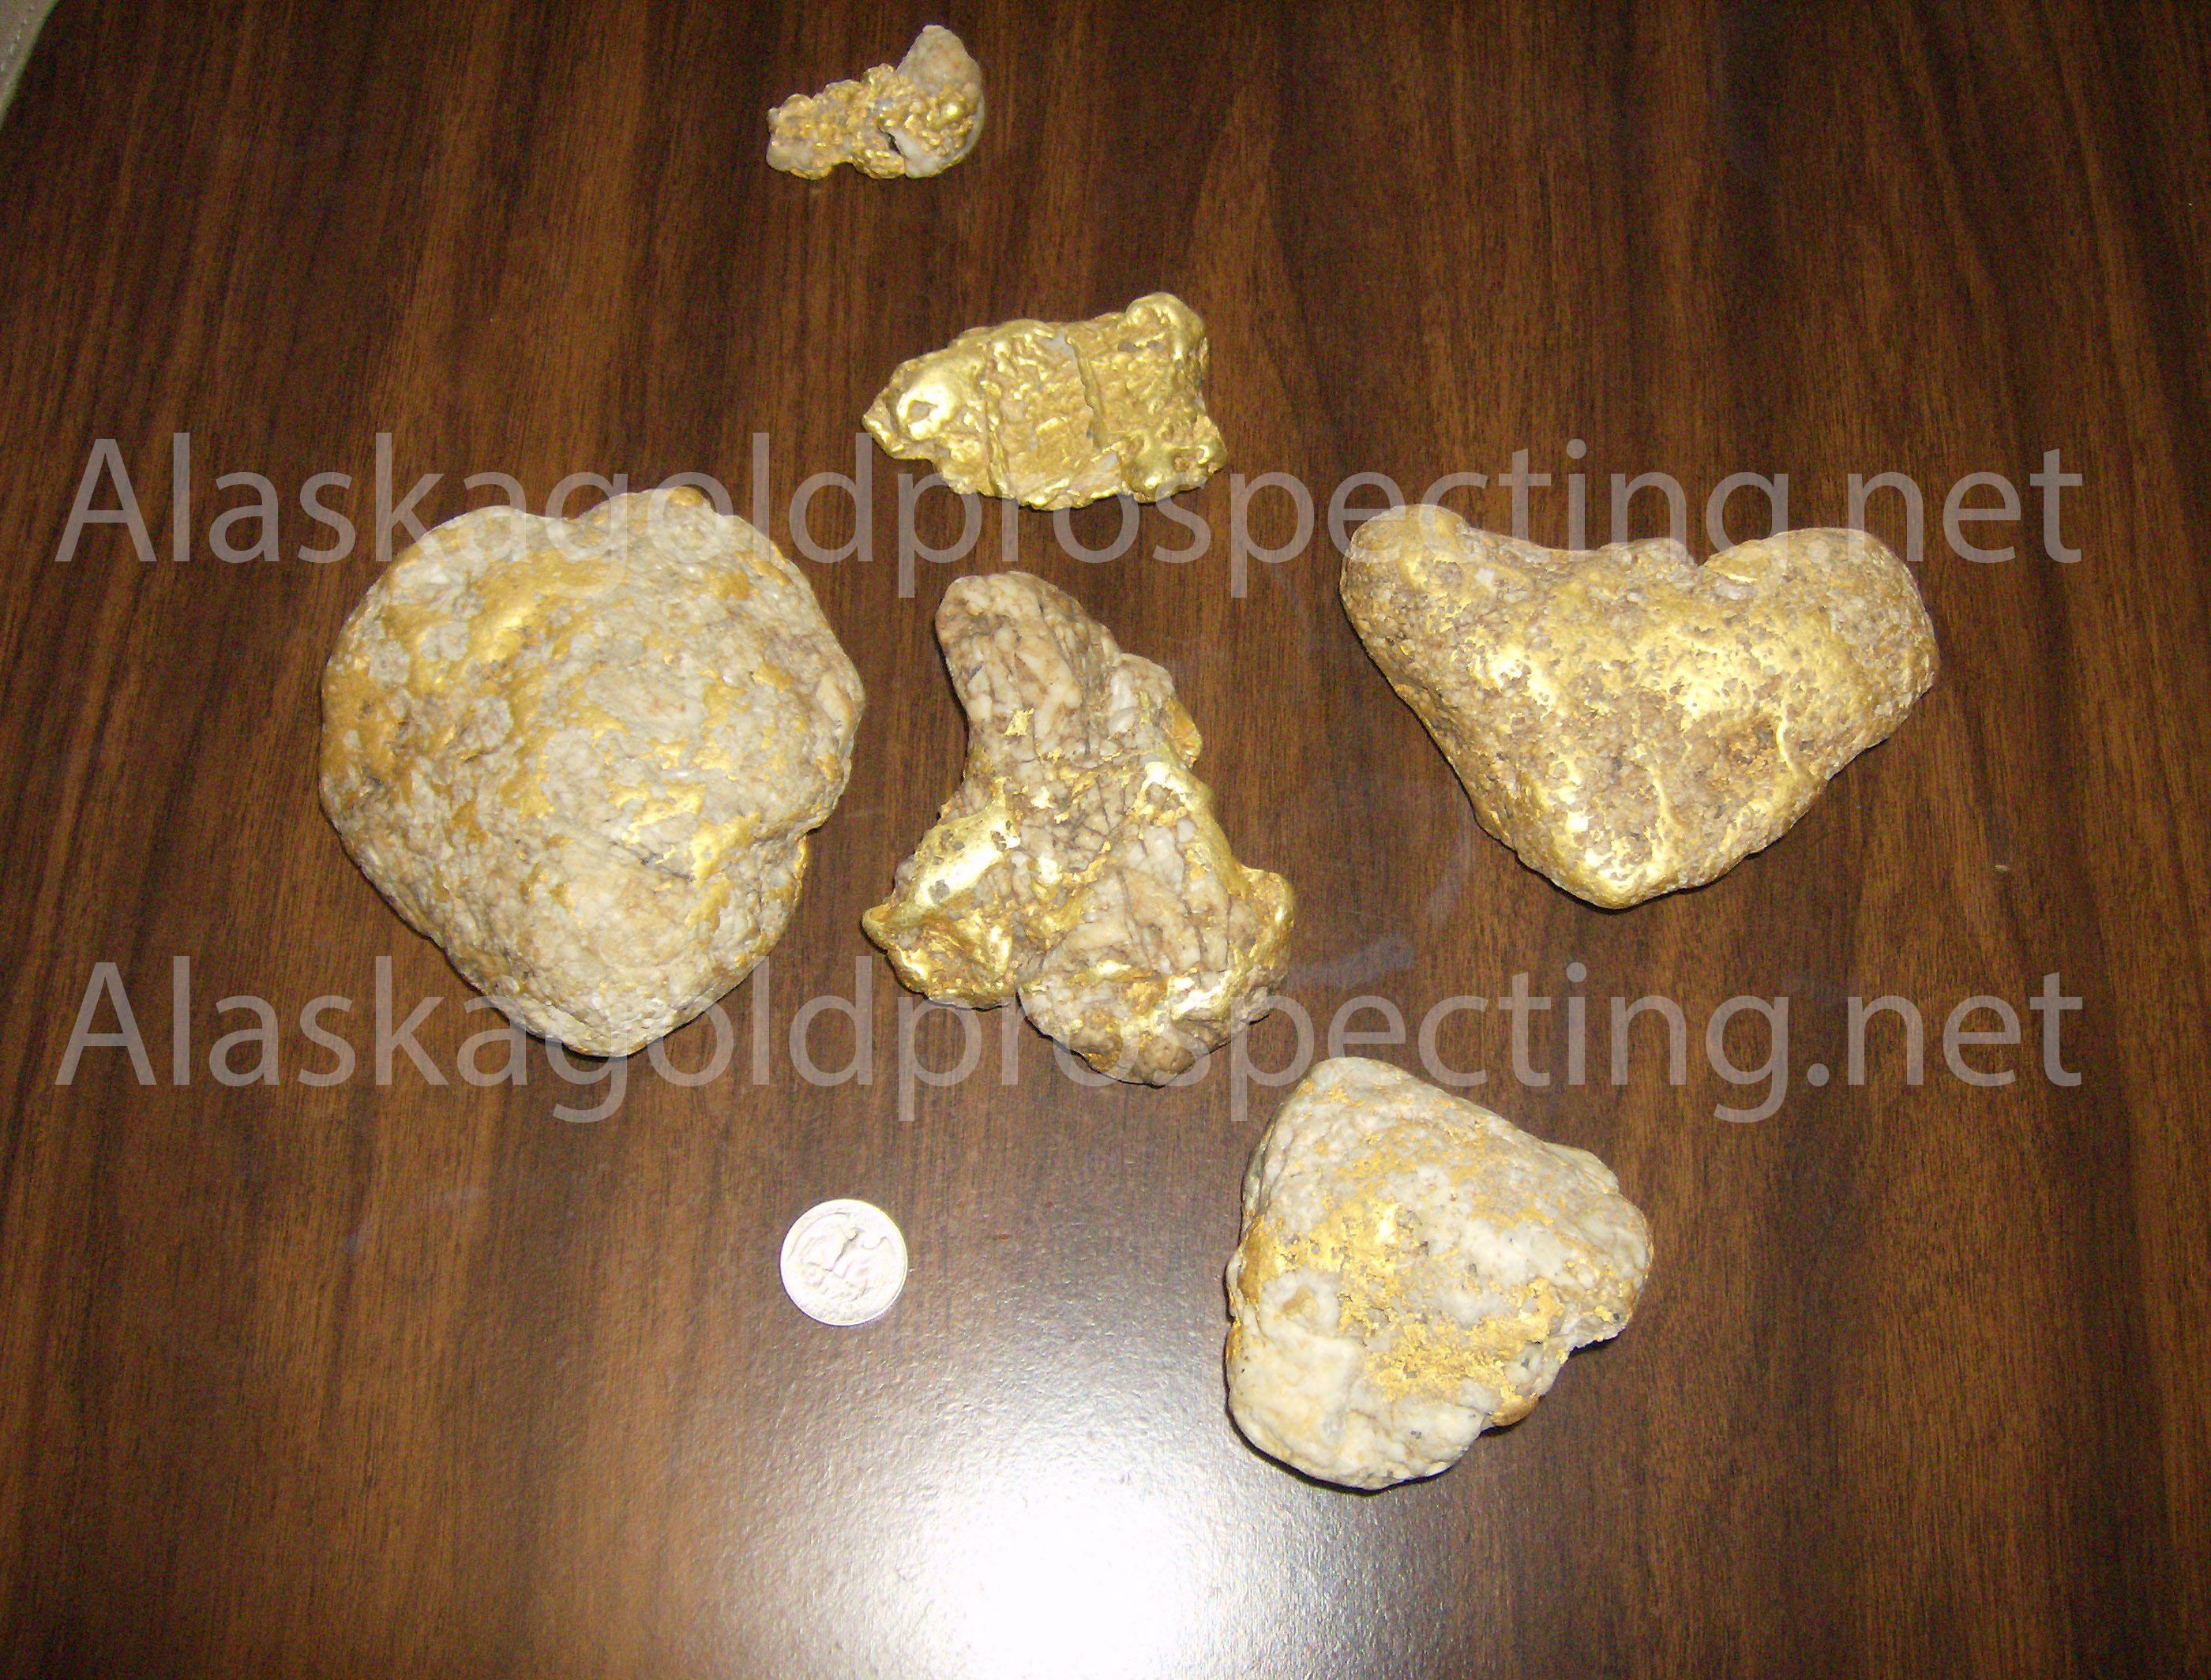 large-alaska-gold